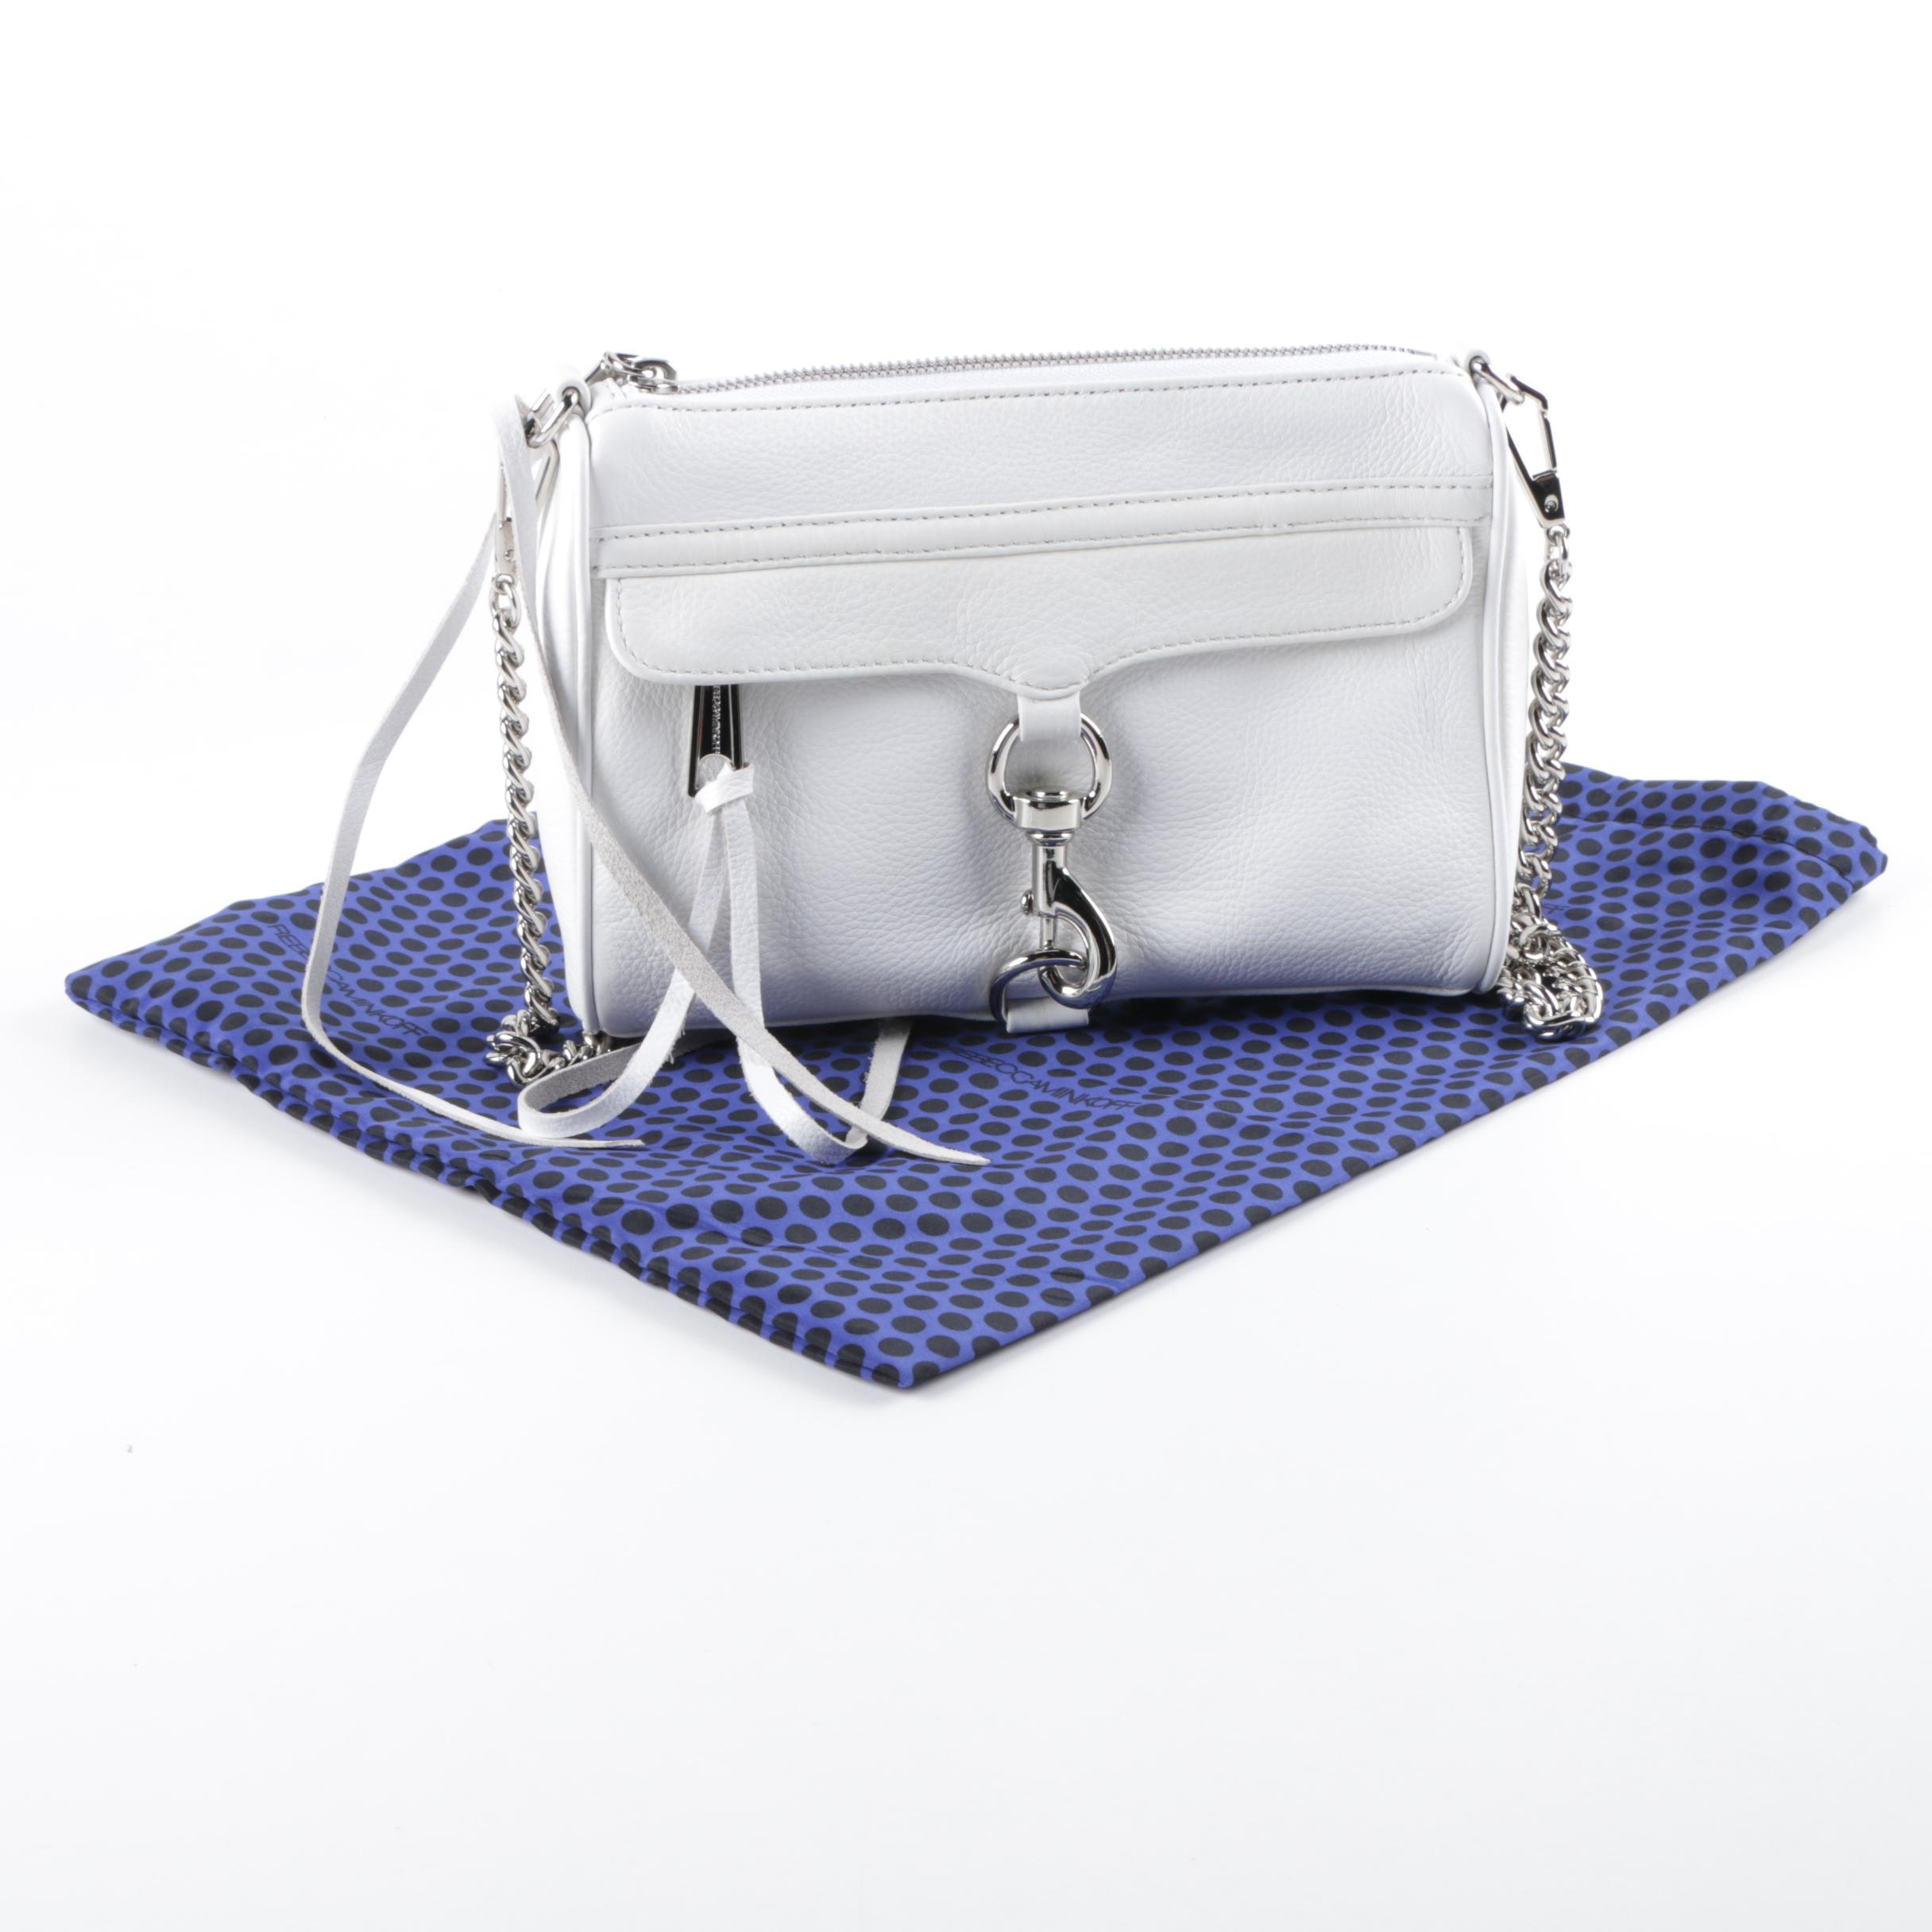 Rebecca Minkoff Mini M.A.C. White Leather Shoulder Bag